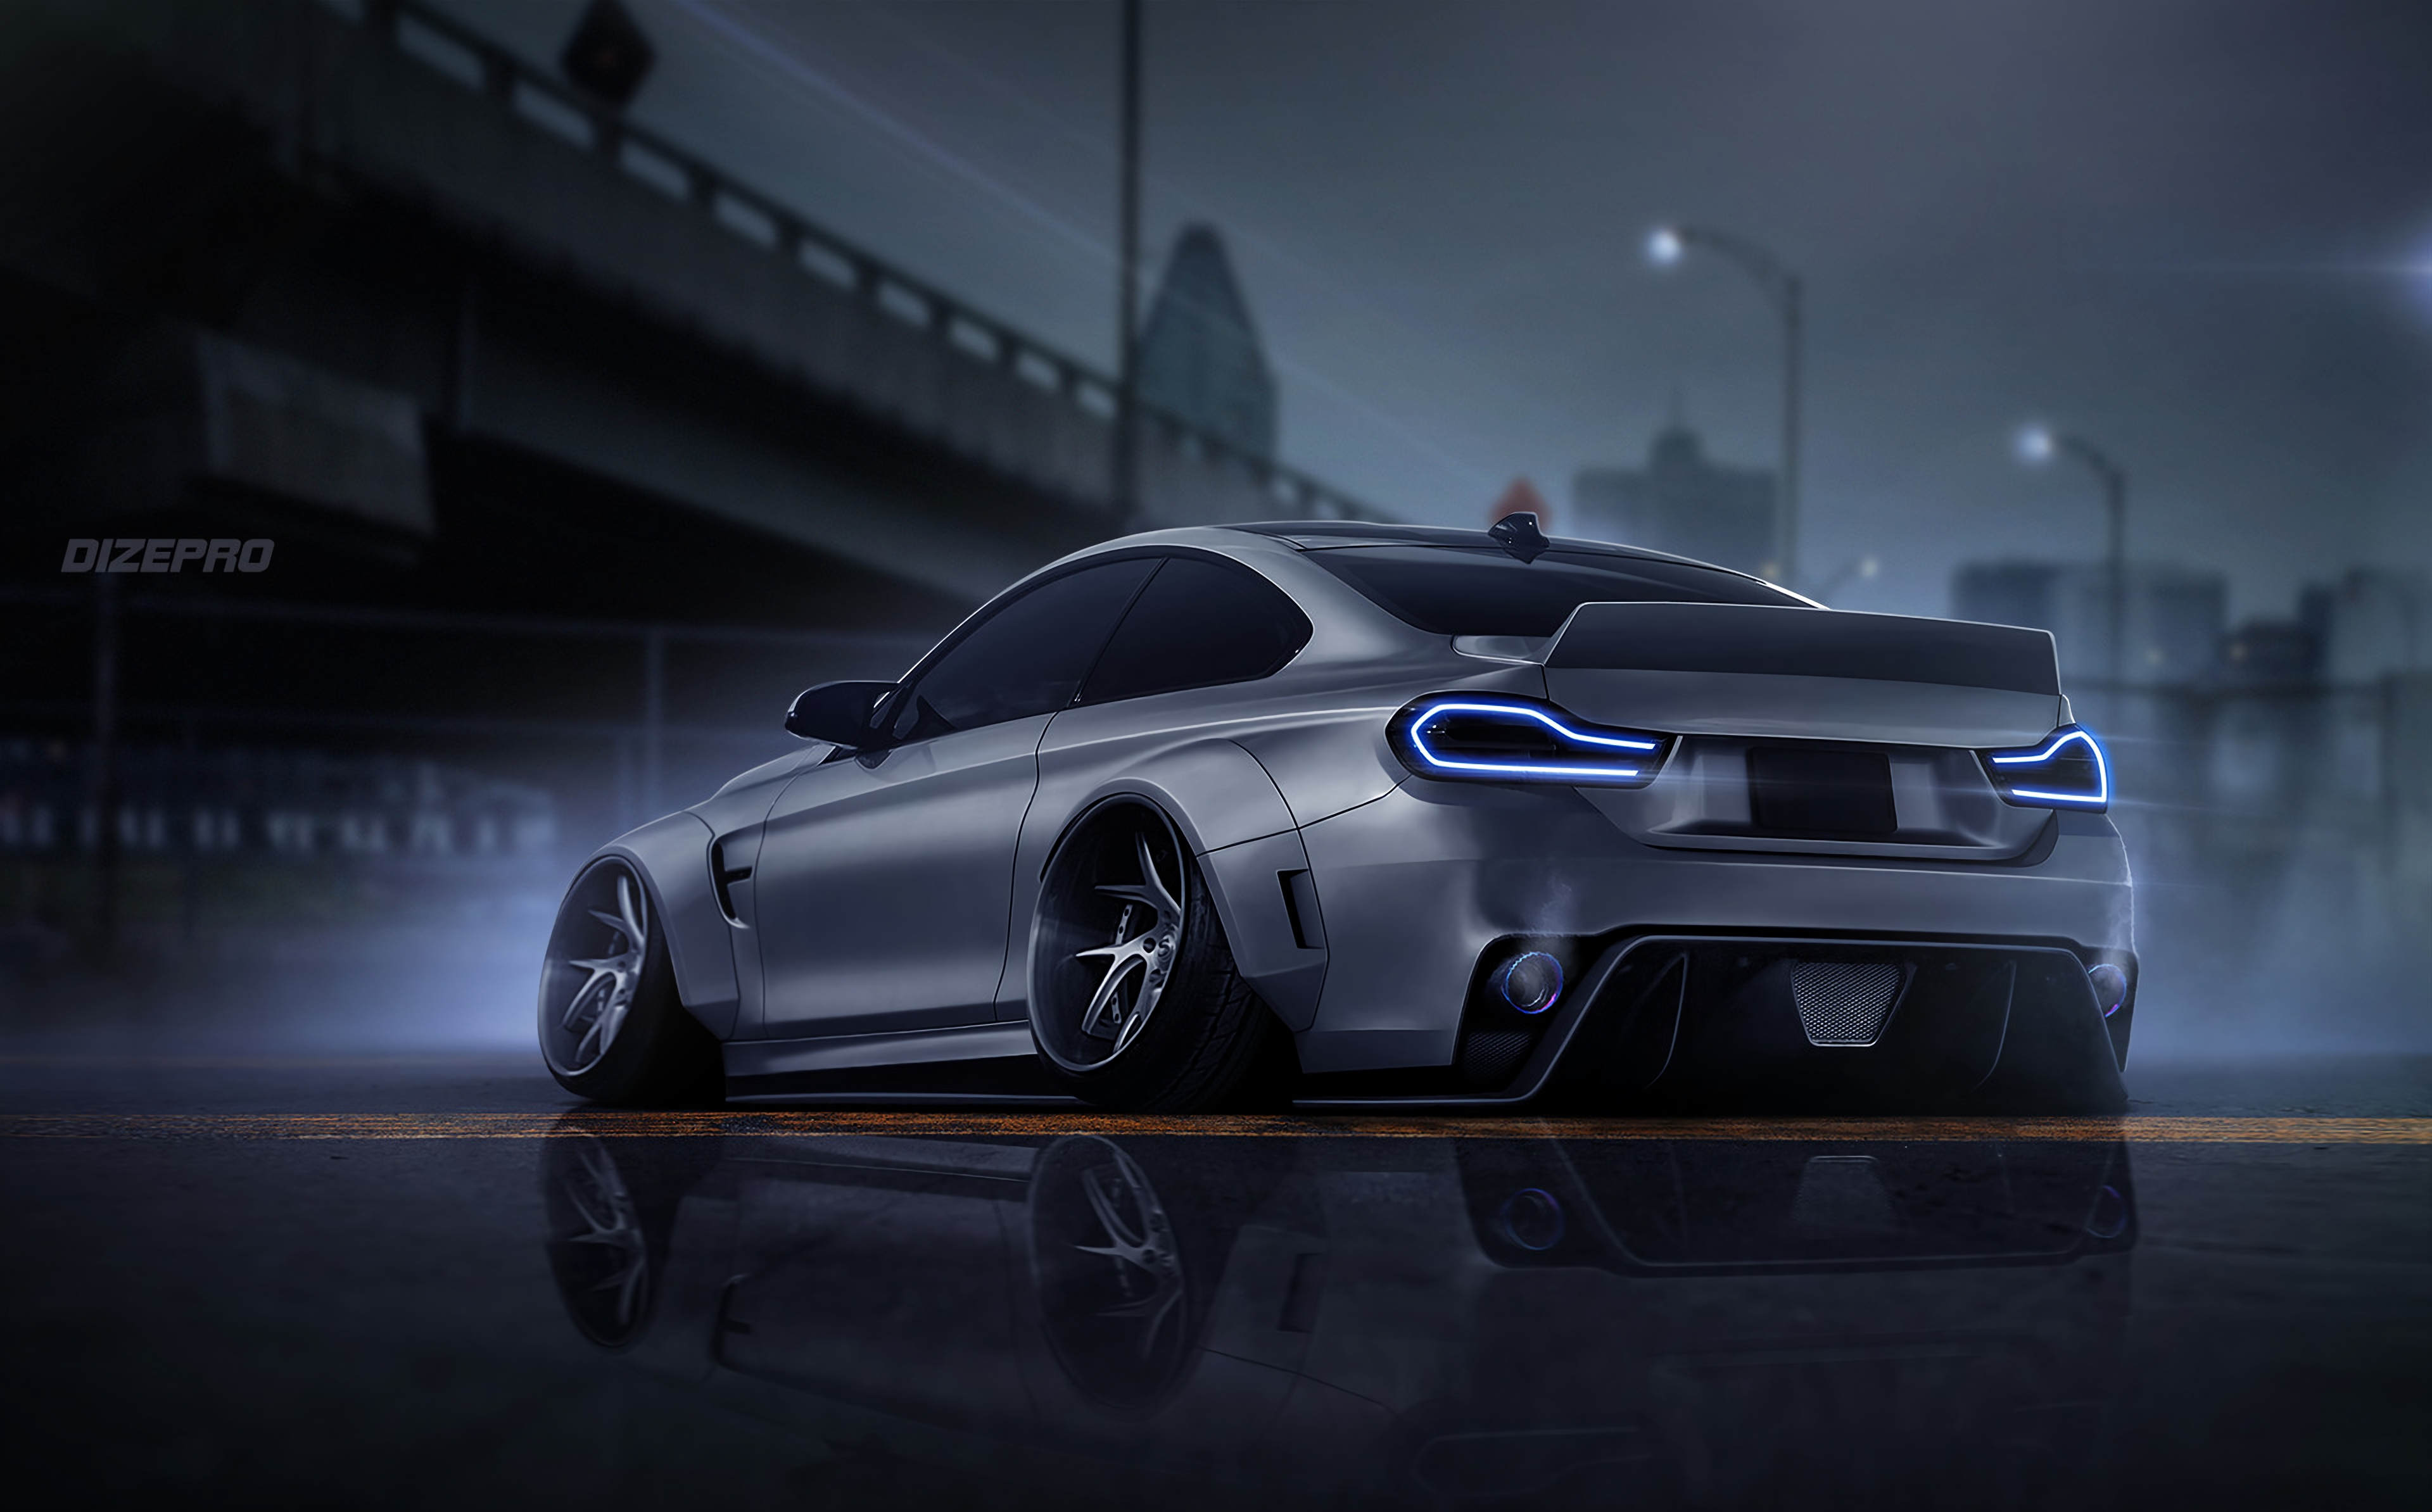 Bmw F82 Dark Side Car Digital Art 4k Hd Cars 4k Wallpapers